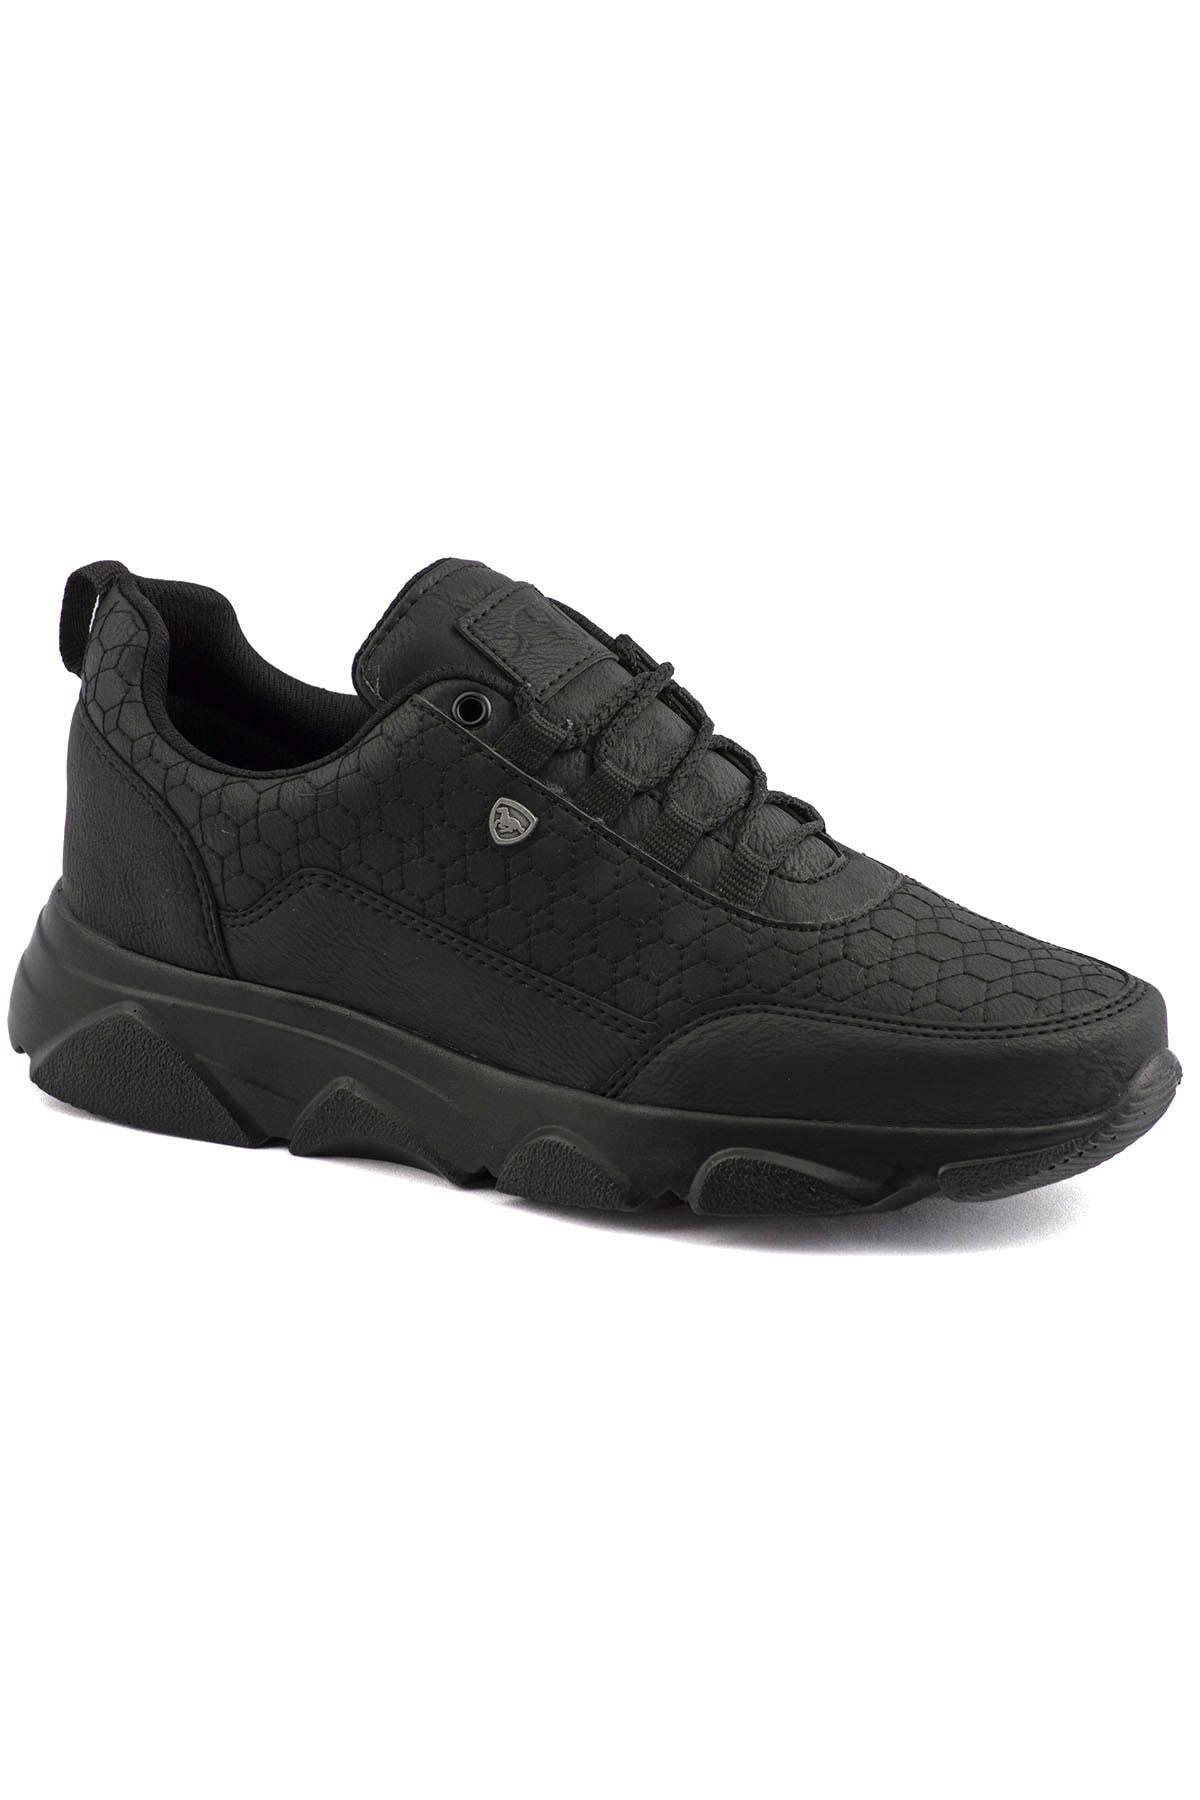 L.A Polo 005 Siyah Siyah Erkek Spor Ayakkabı 1